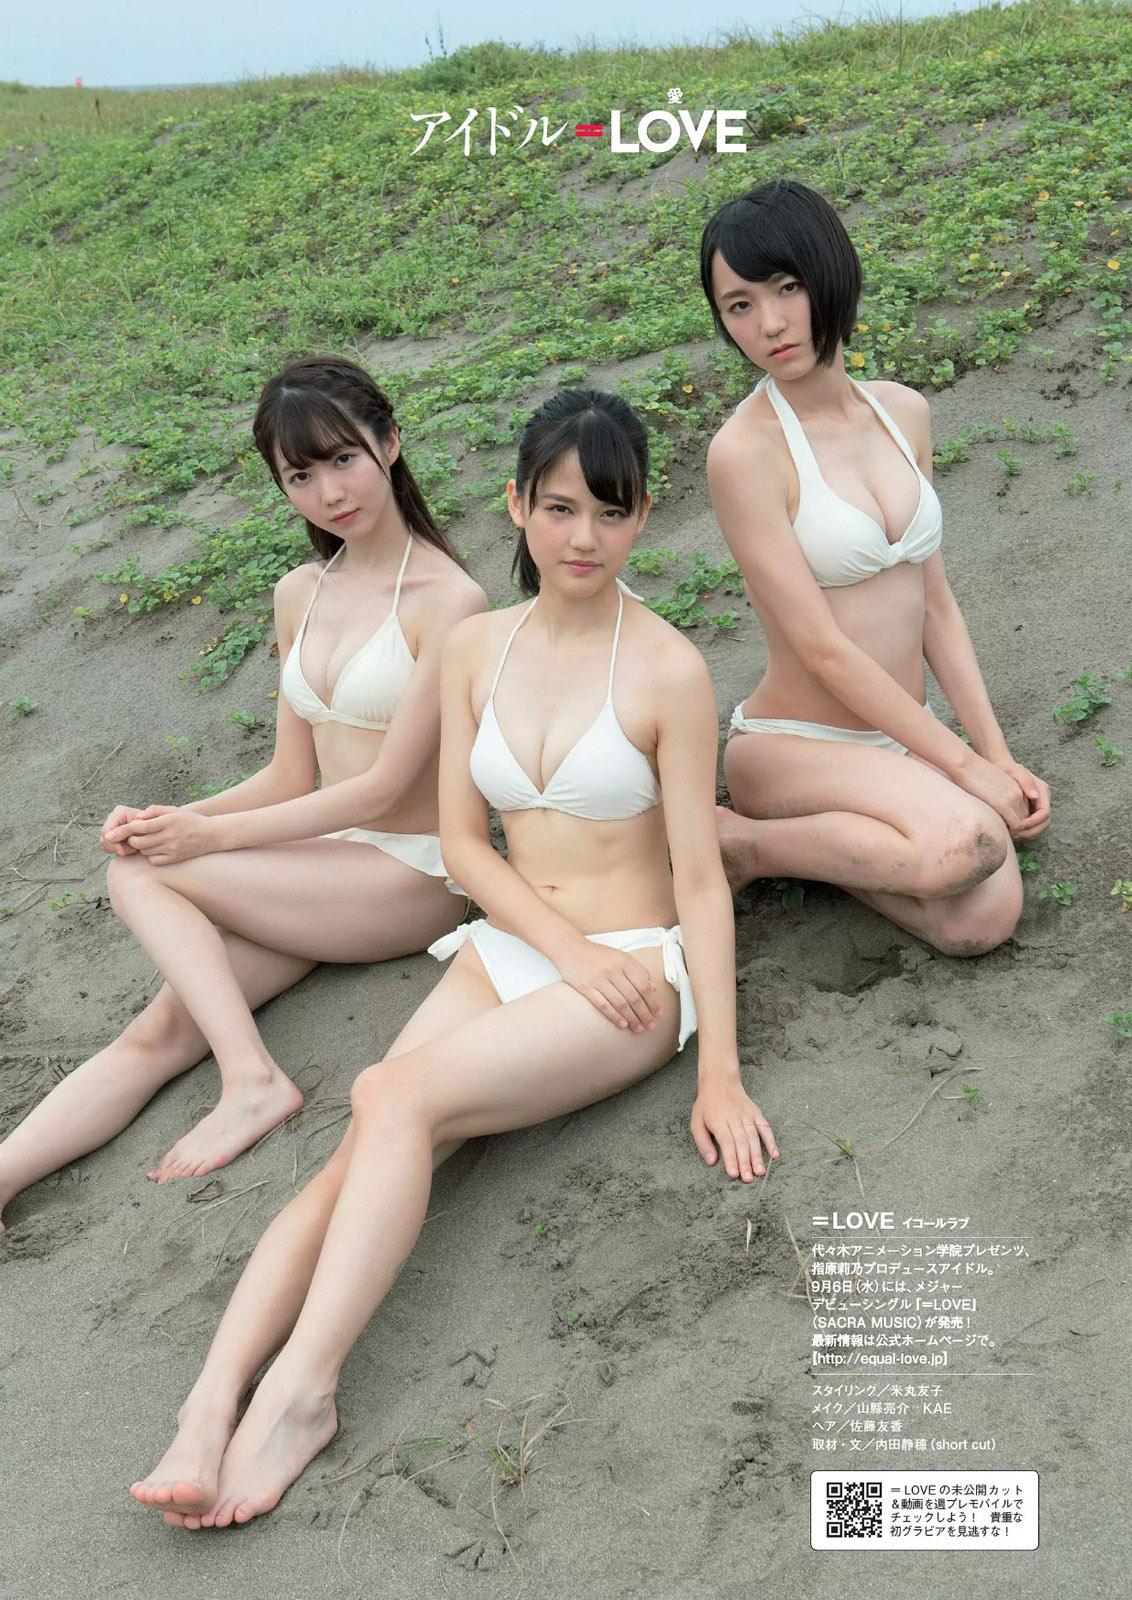 Takamatsu Hitomi 高松瞳, Otani Emiri 大谷映美里, Noguchi Iori 野口衣織, Weekly Playboy 2017 No.38 (週刊プレイボーイ 2017年38号)